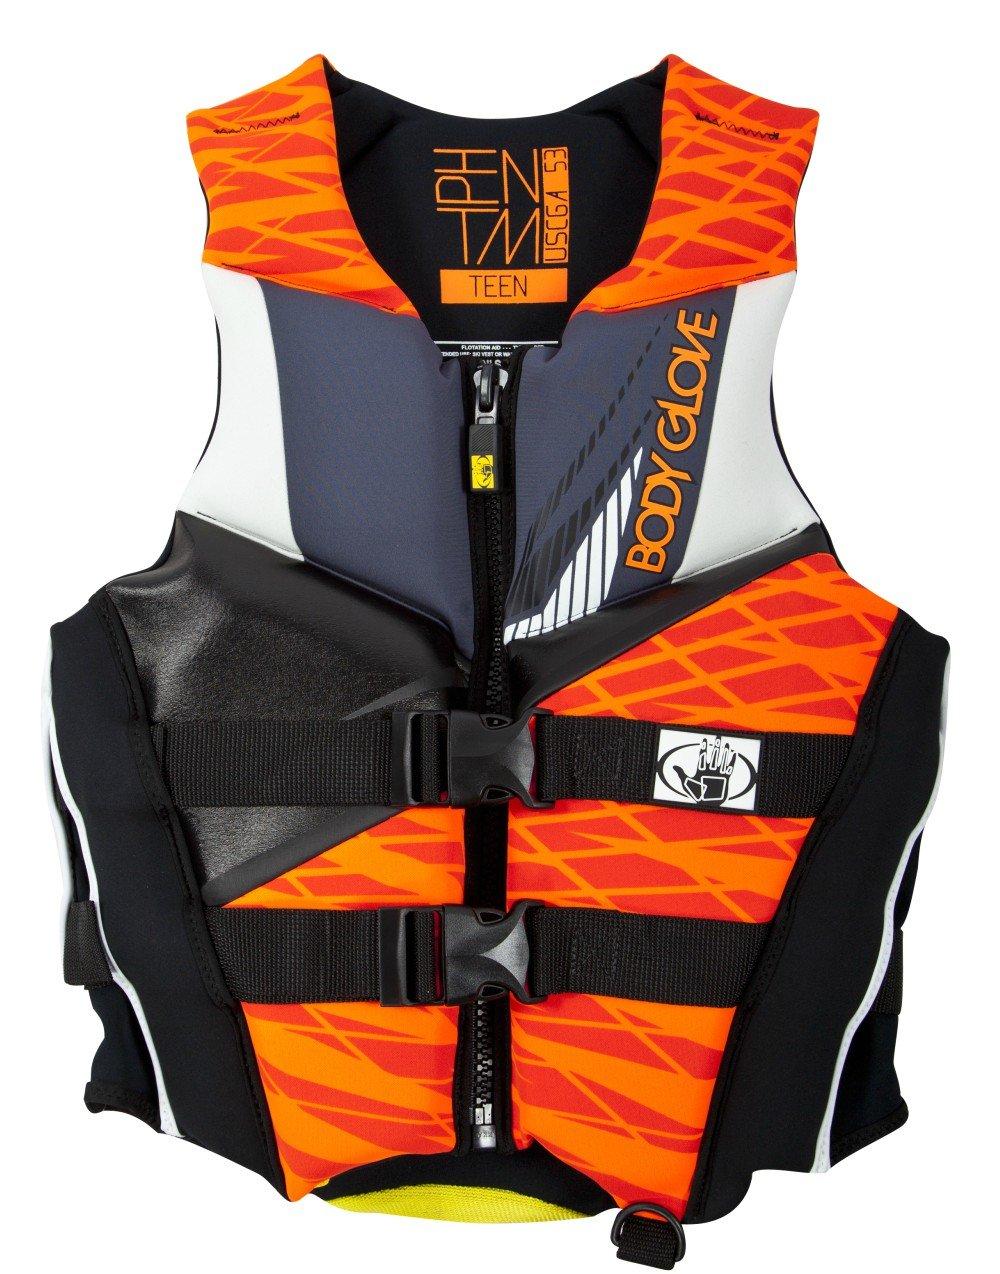 Body Glove Men's Phantom Life Jacket, Neoprene Shell, Foam Flotation, Front Zippered Opening, USCG Approved